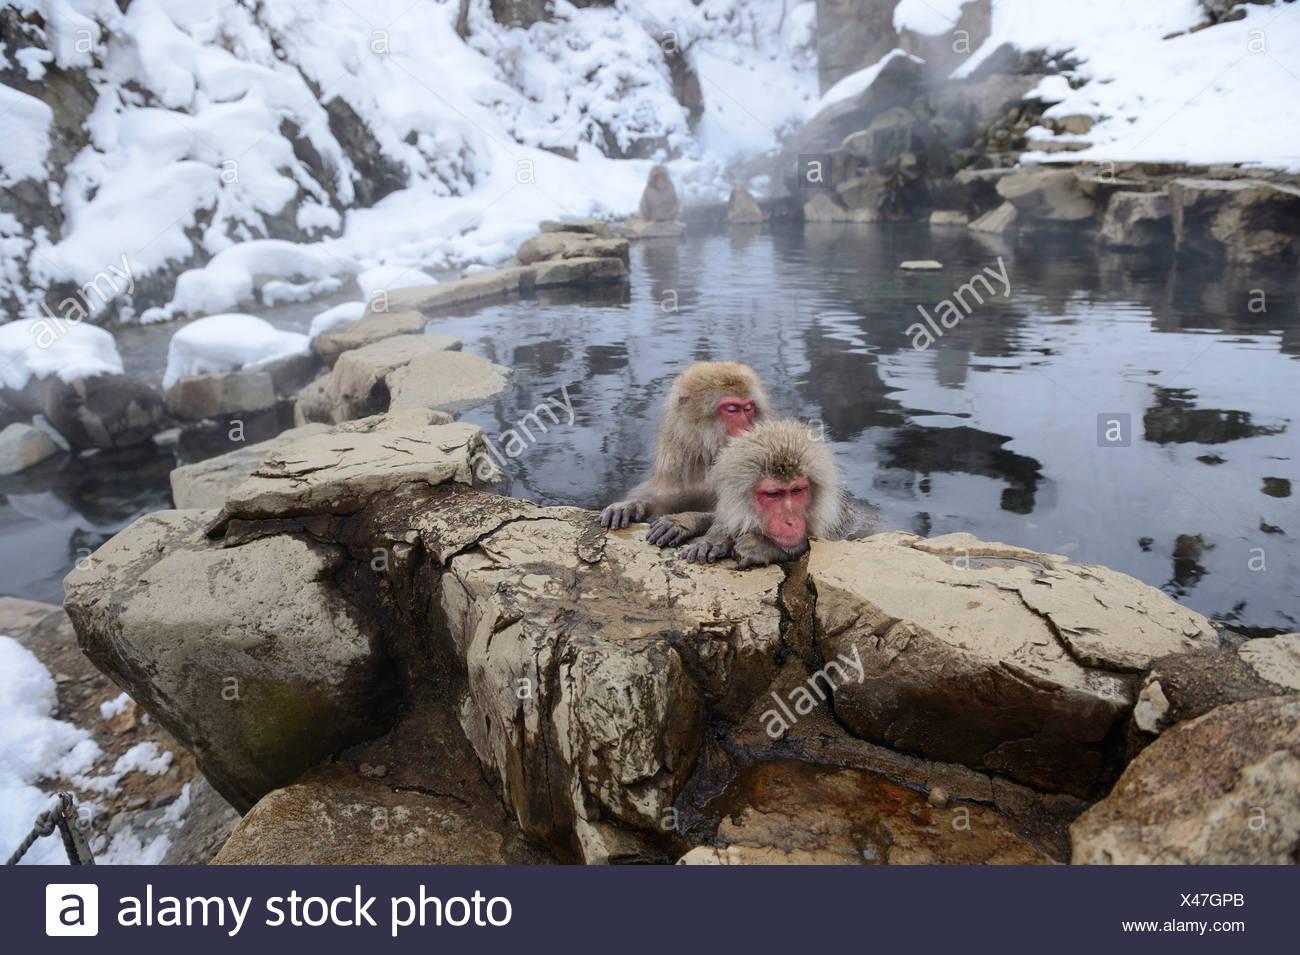 Japanese Macaques or Snow Monkeys (Macaca fuscata), taking a bath in a hot spring, Affenpark Jigokudani, Nagano Präfektur - Stock Image